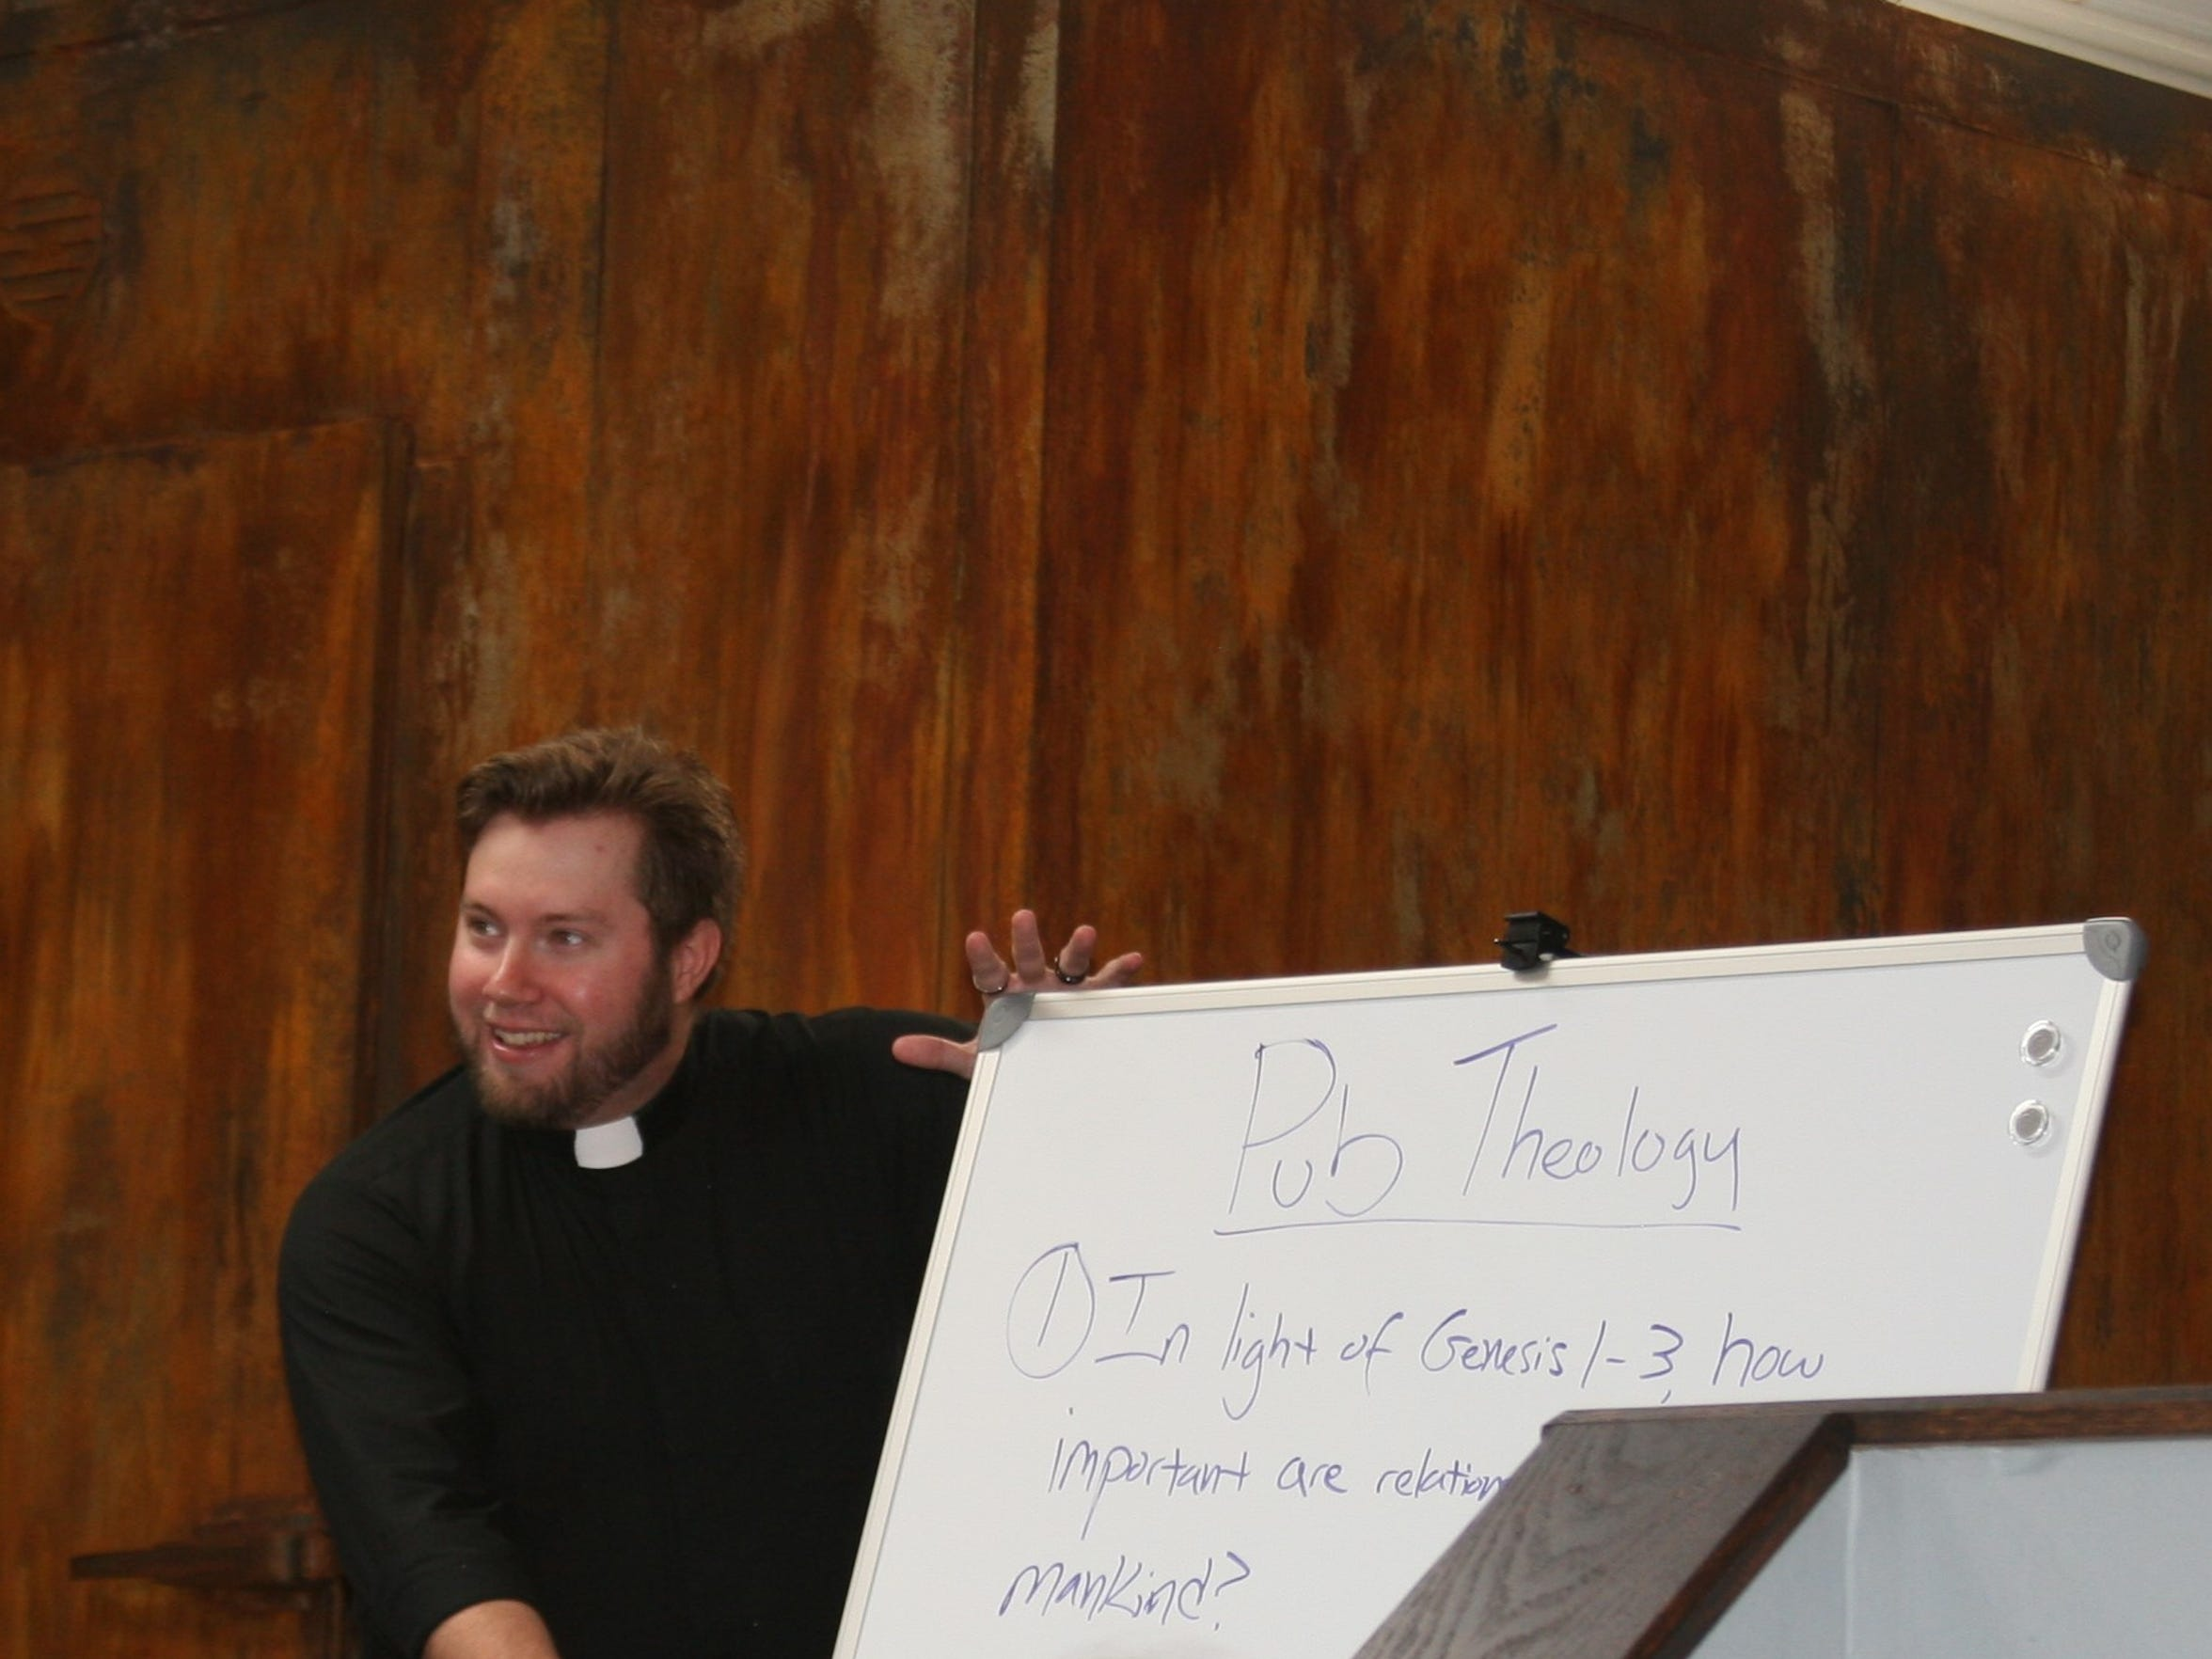 Redeemer Lutheran Church Associate Pastor Thomas Presley